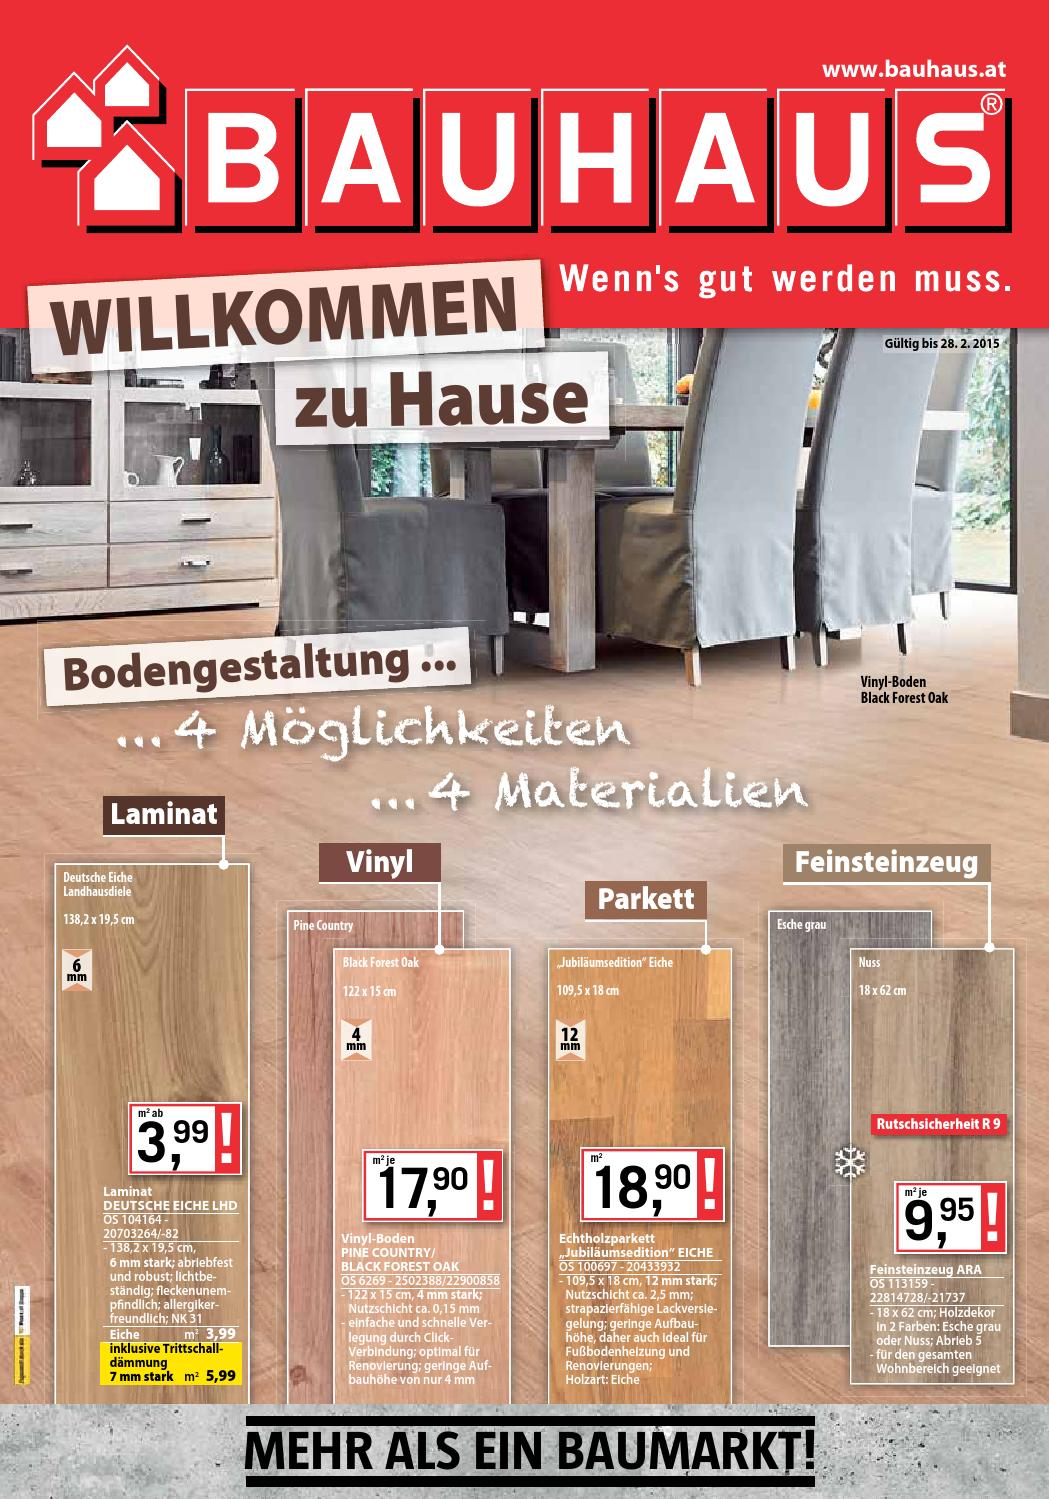 Bauhaus angebote 3 28feber2015 by issuu - Bauhaus regensburg angebote ...